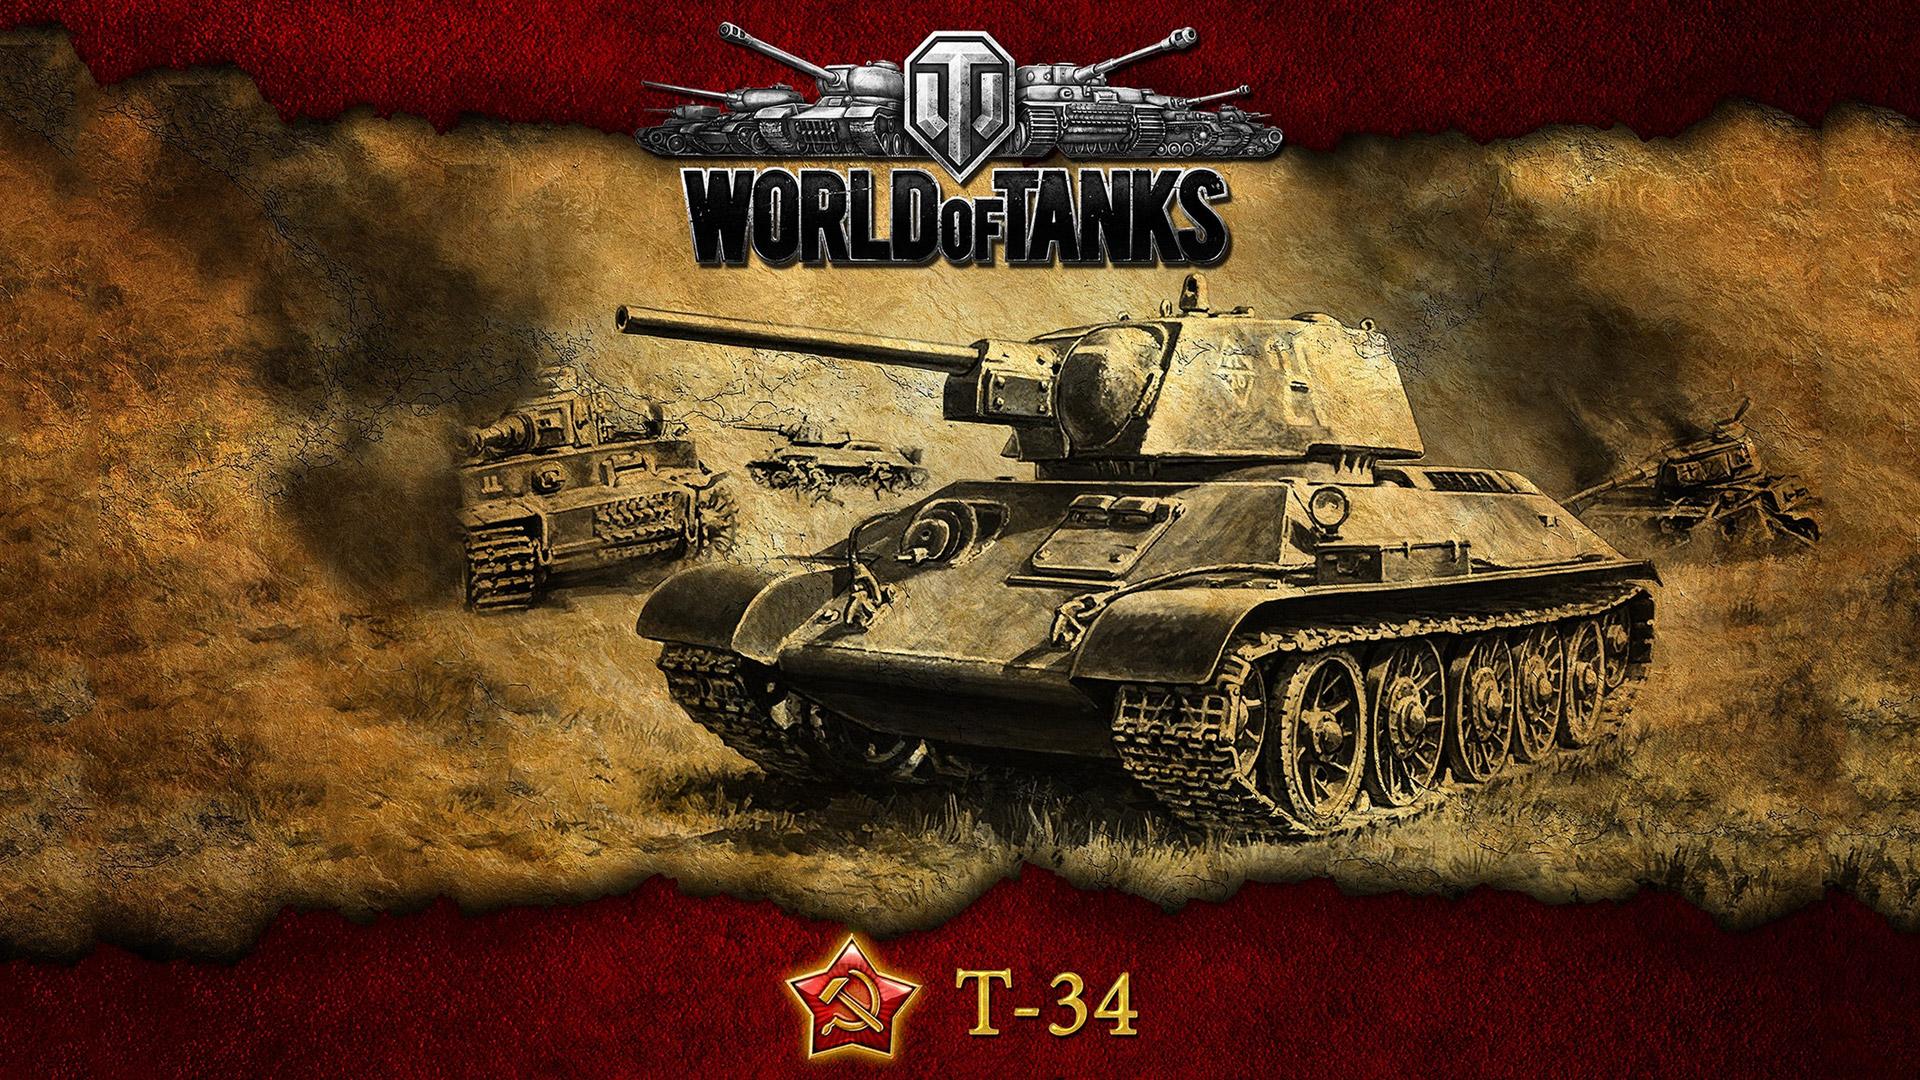 World of Tanks Wallpaper in 1920x1080